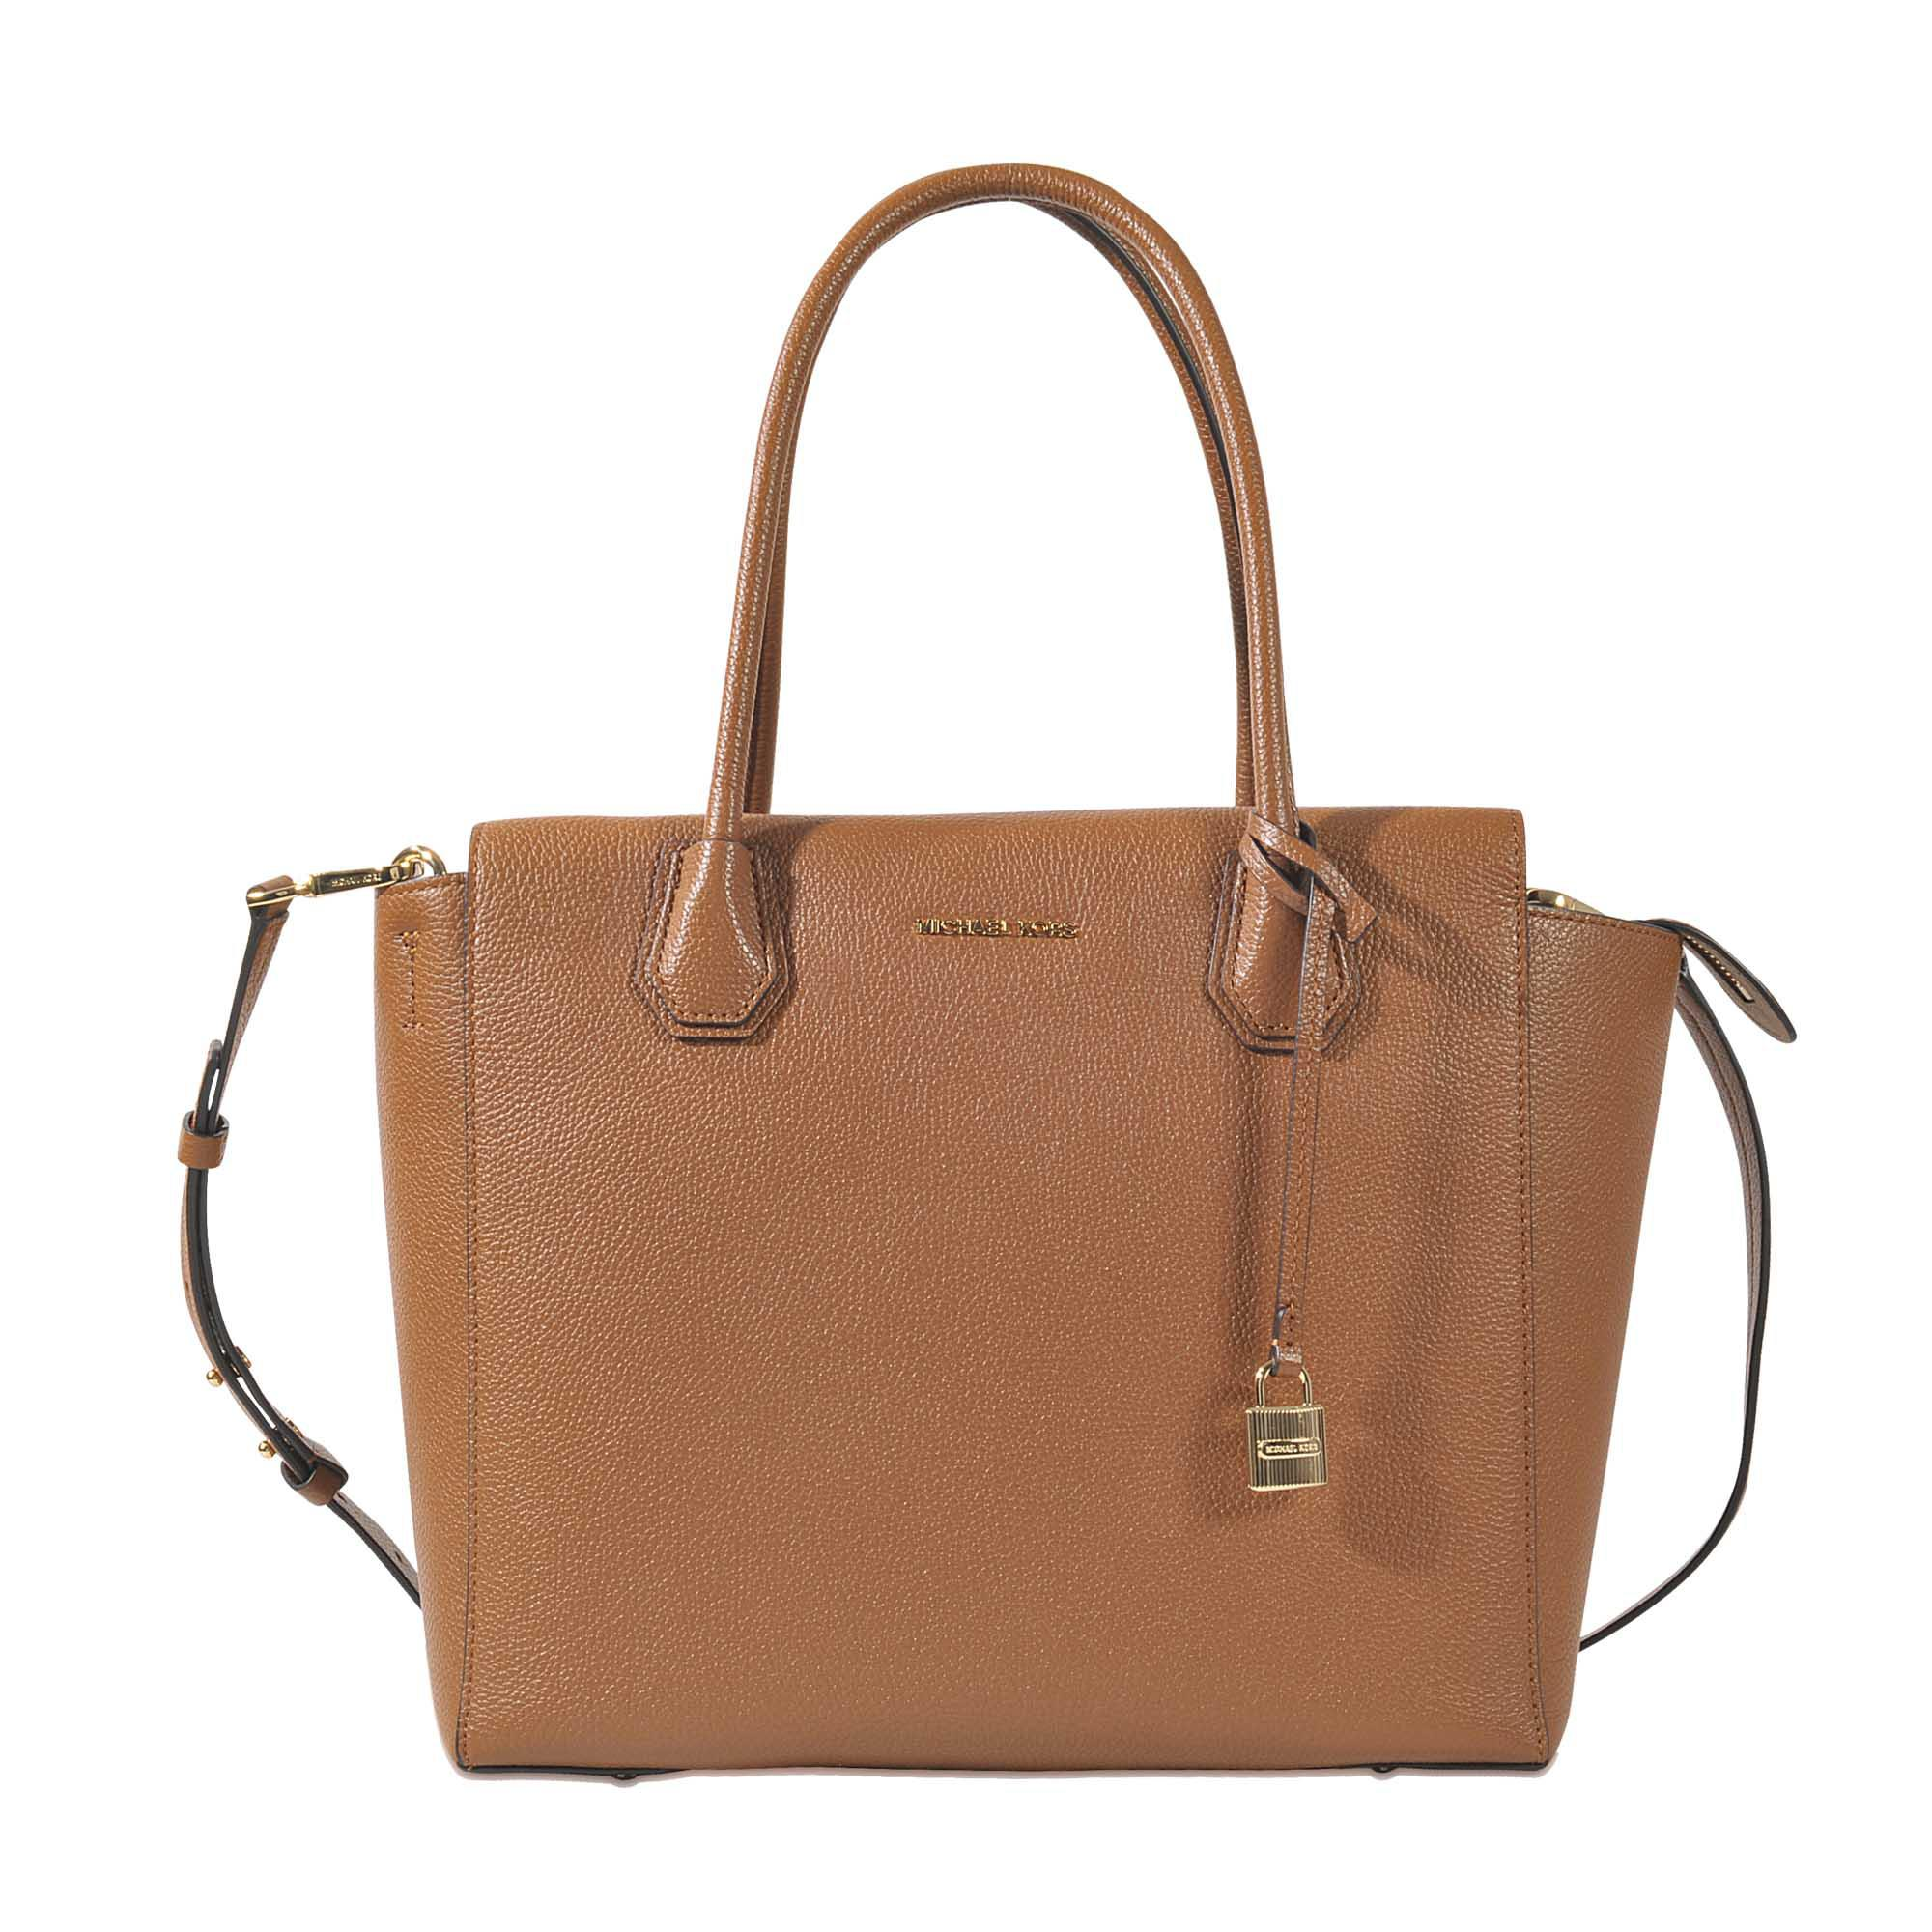 77f63510cd Lyst - Michael Michael Kors Mercer Large Satchel Bag in Brown